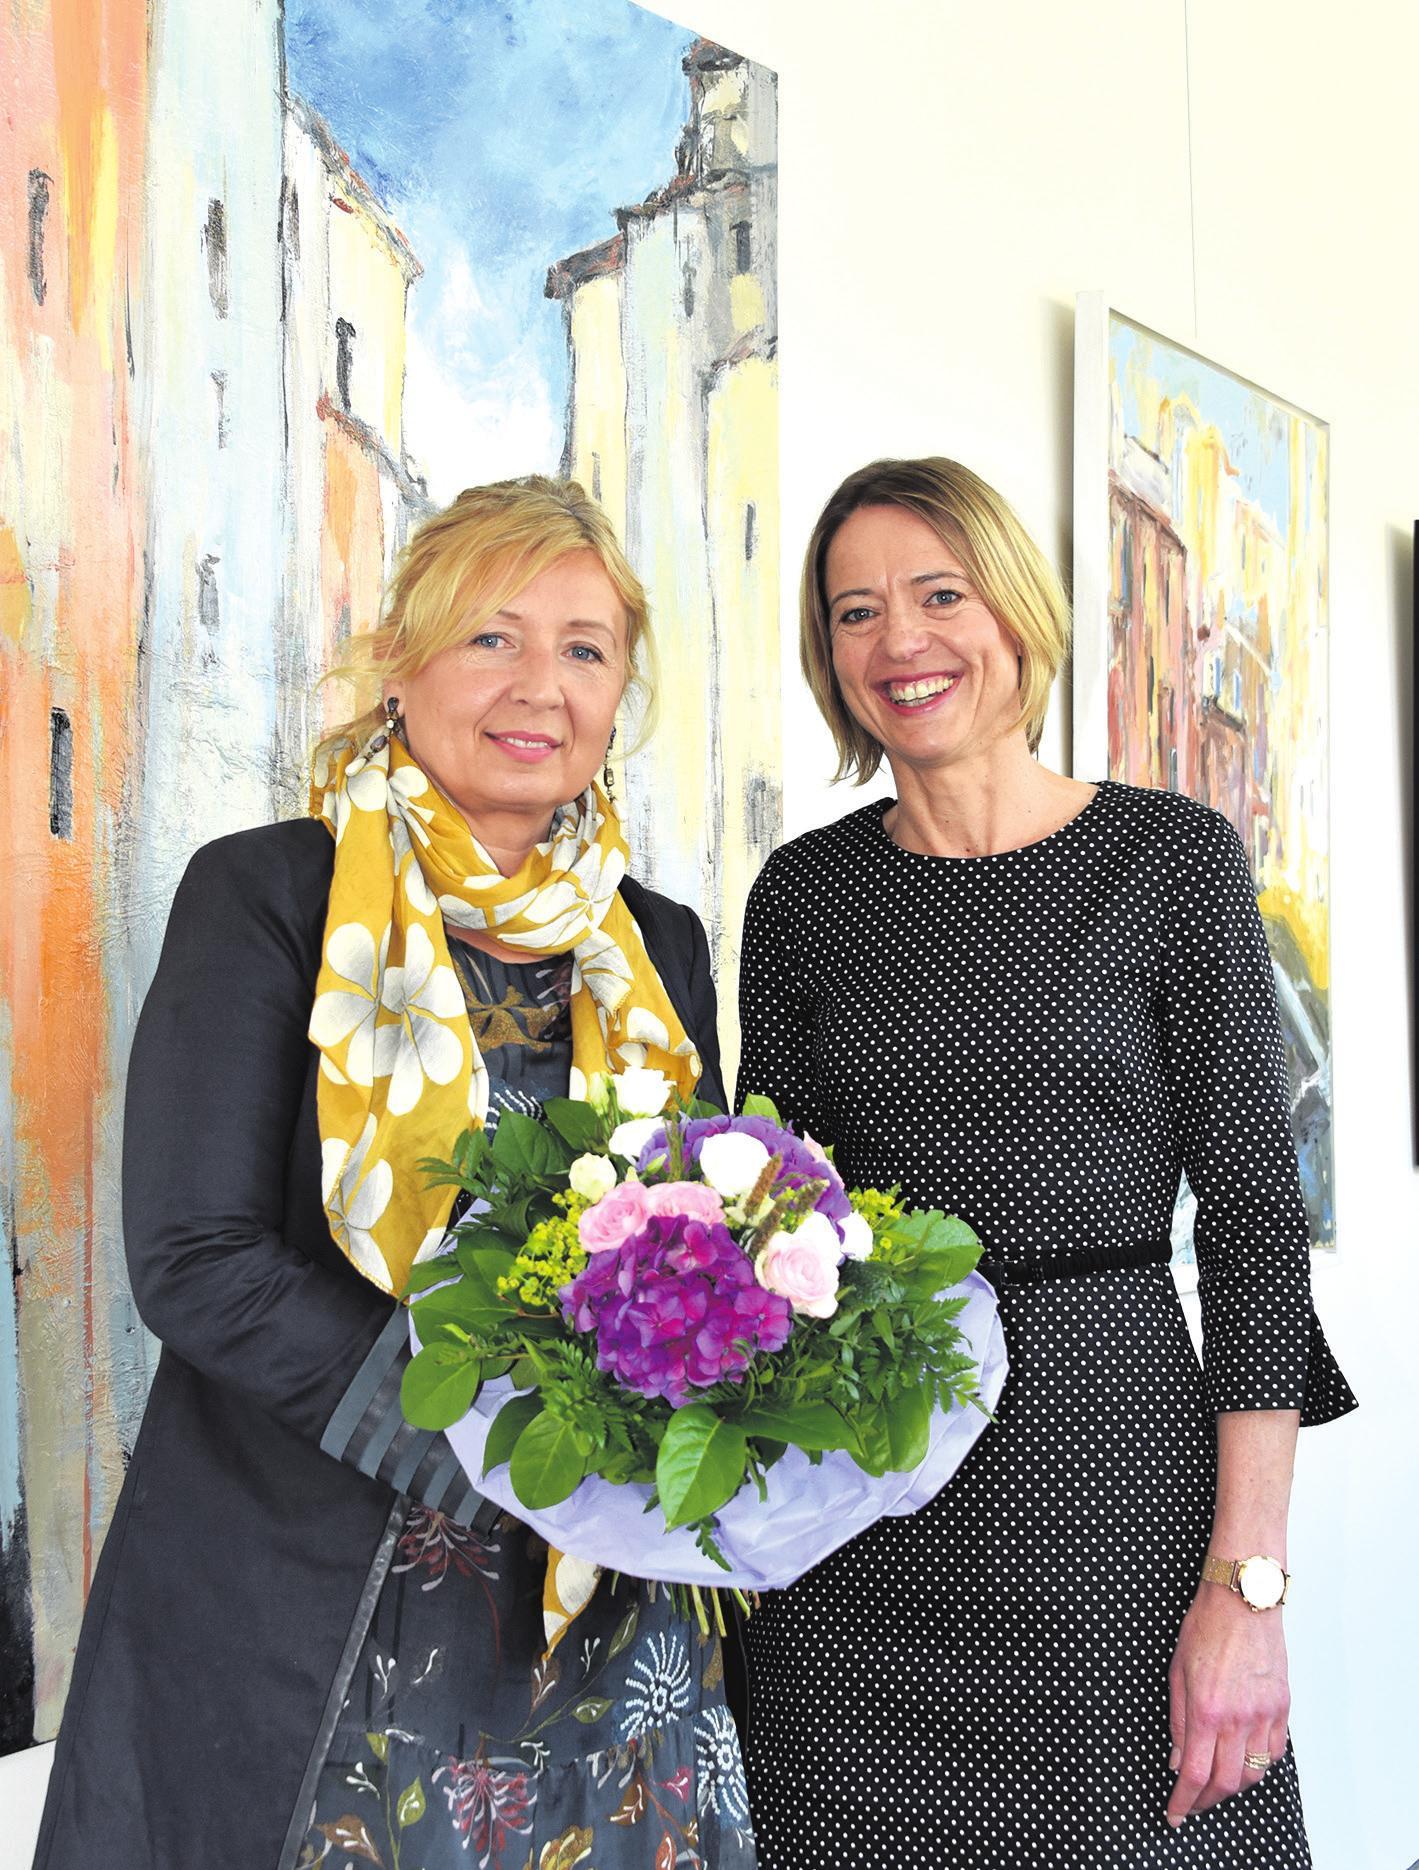 Ewelina Biermann-Firek (links) und OLG-Präsidentin Stefanie Otte. Foto: ©OLG Celle, Jacqueline Laski